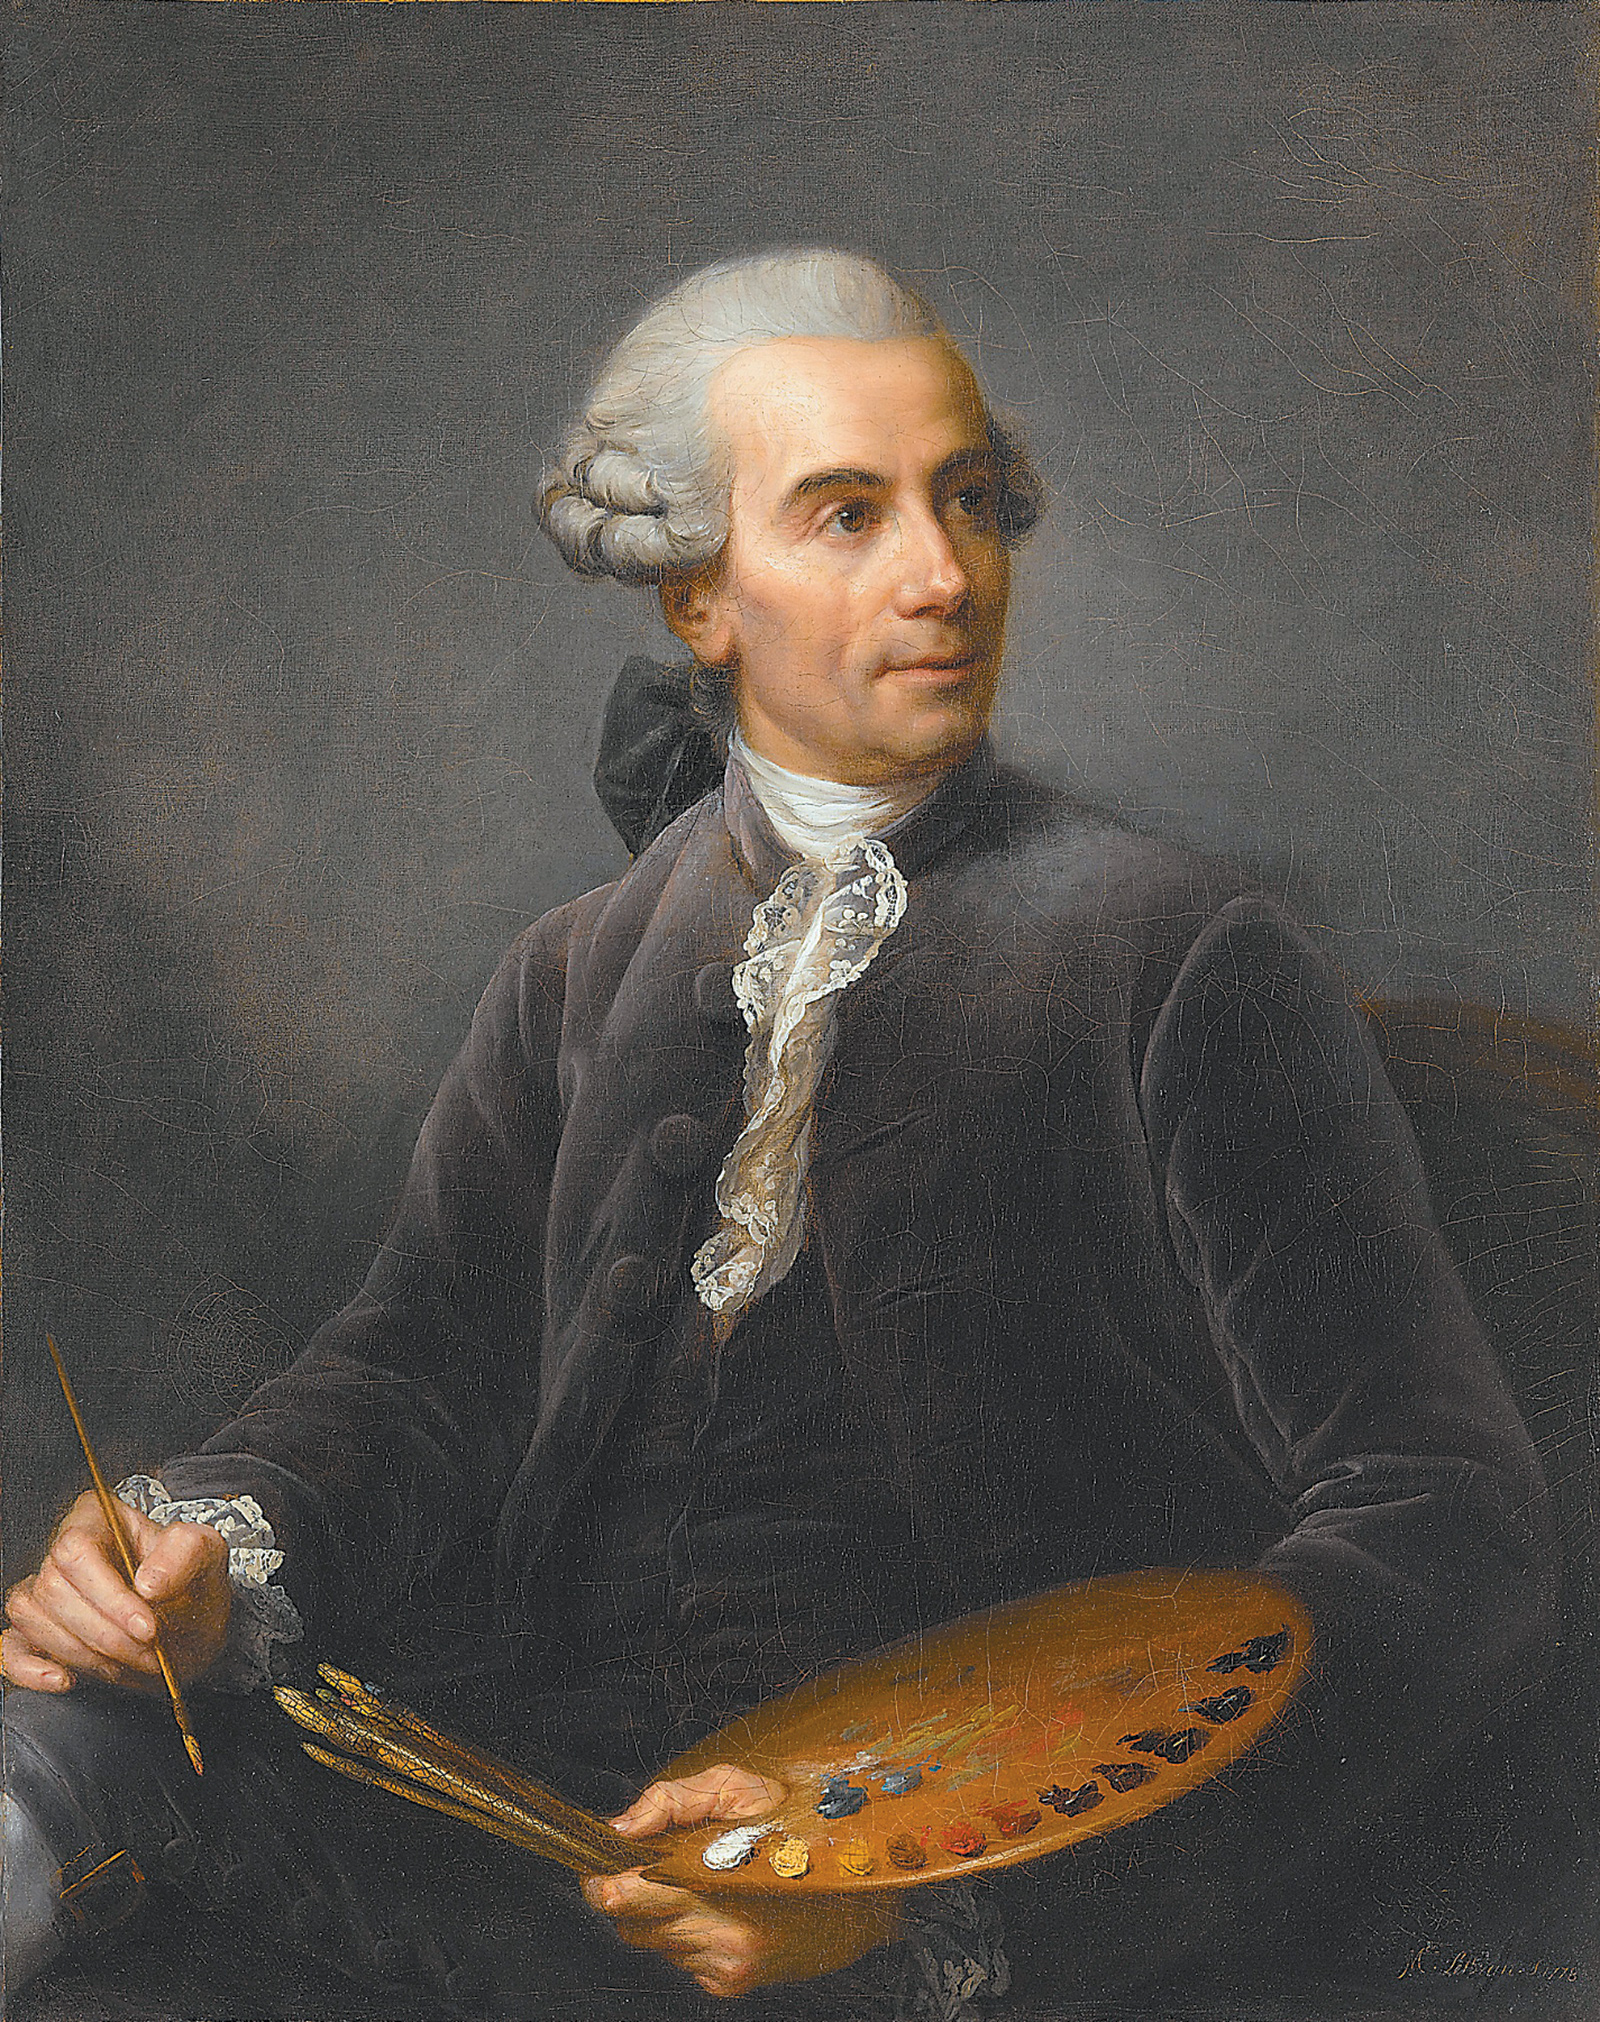 Élisabeth Louise Vigée Le Brun: Joseph Vernet, circa 1778